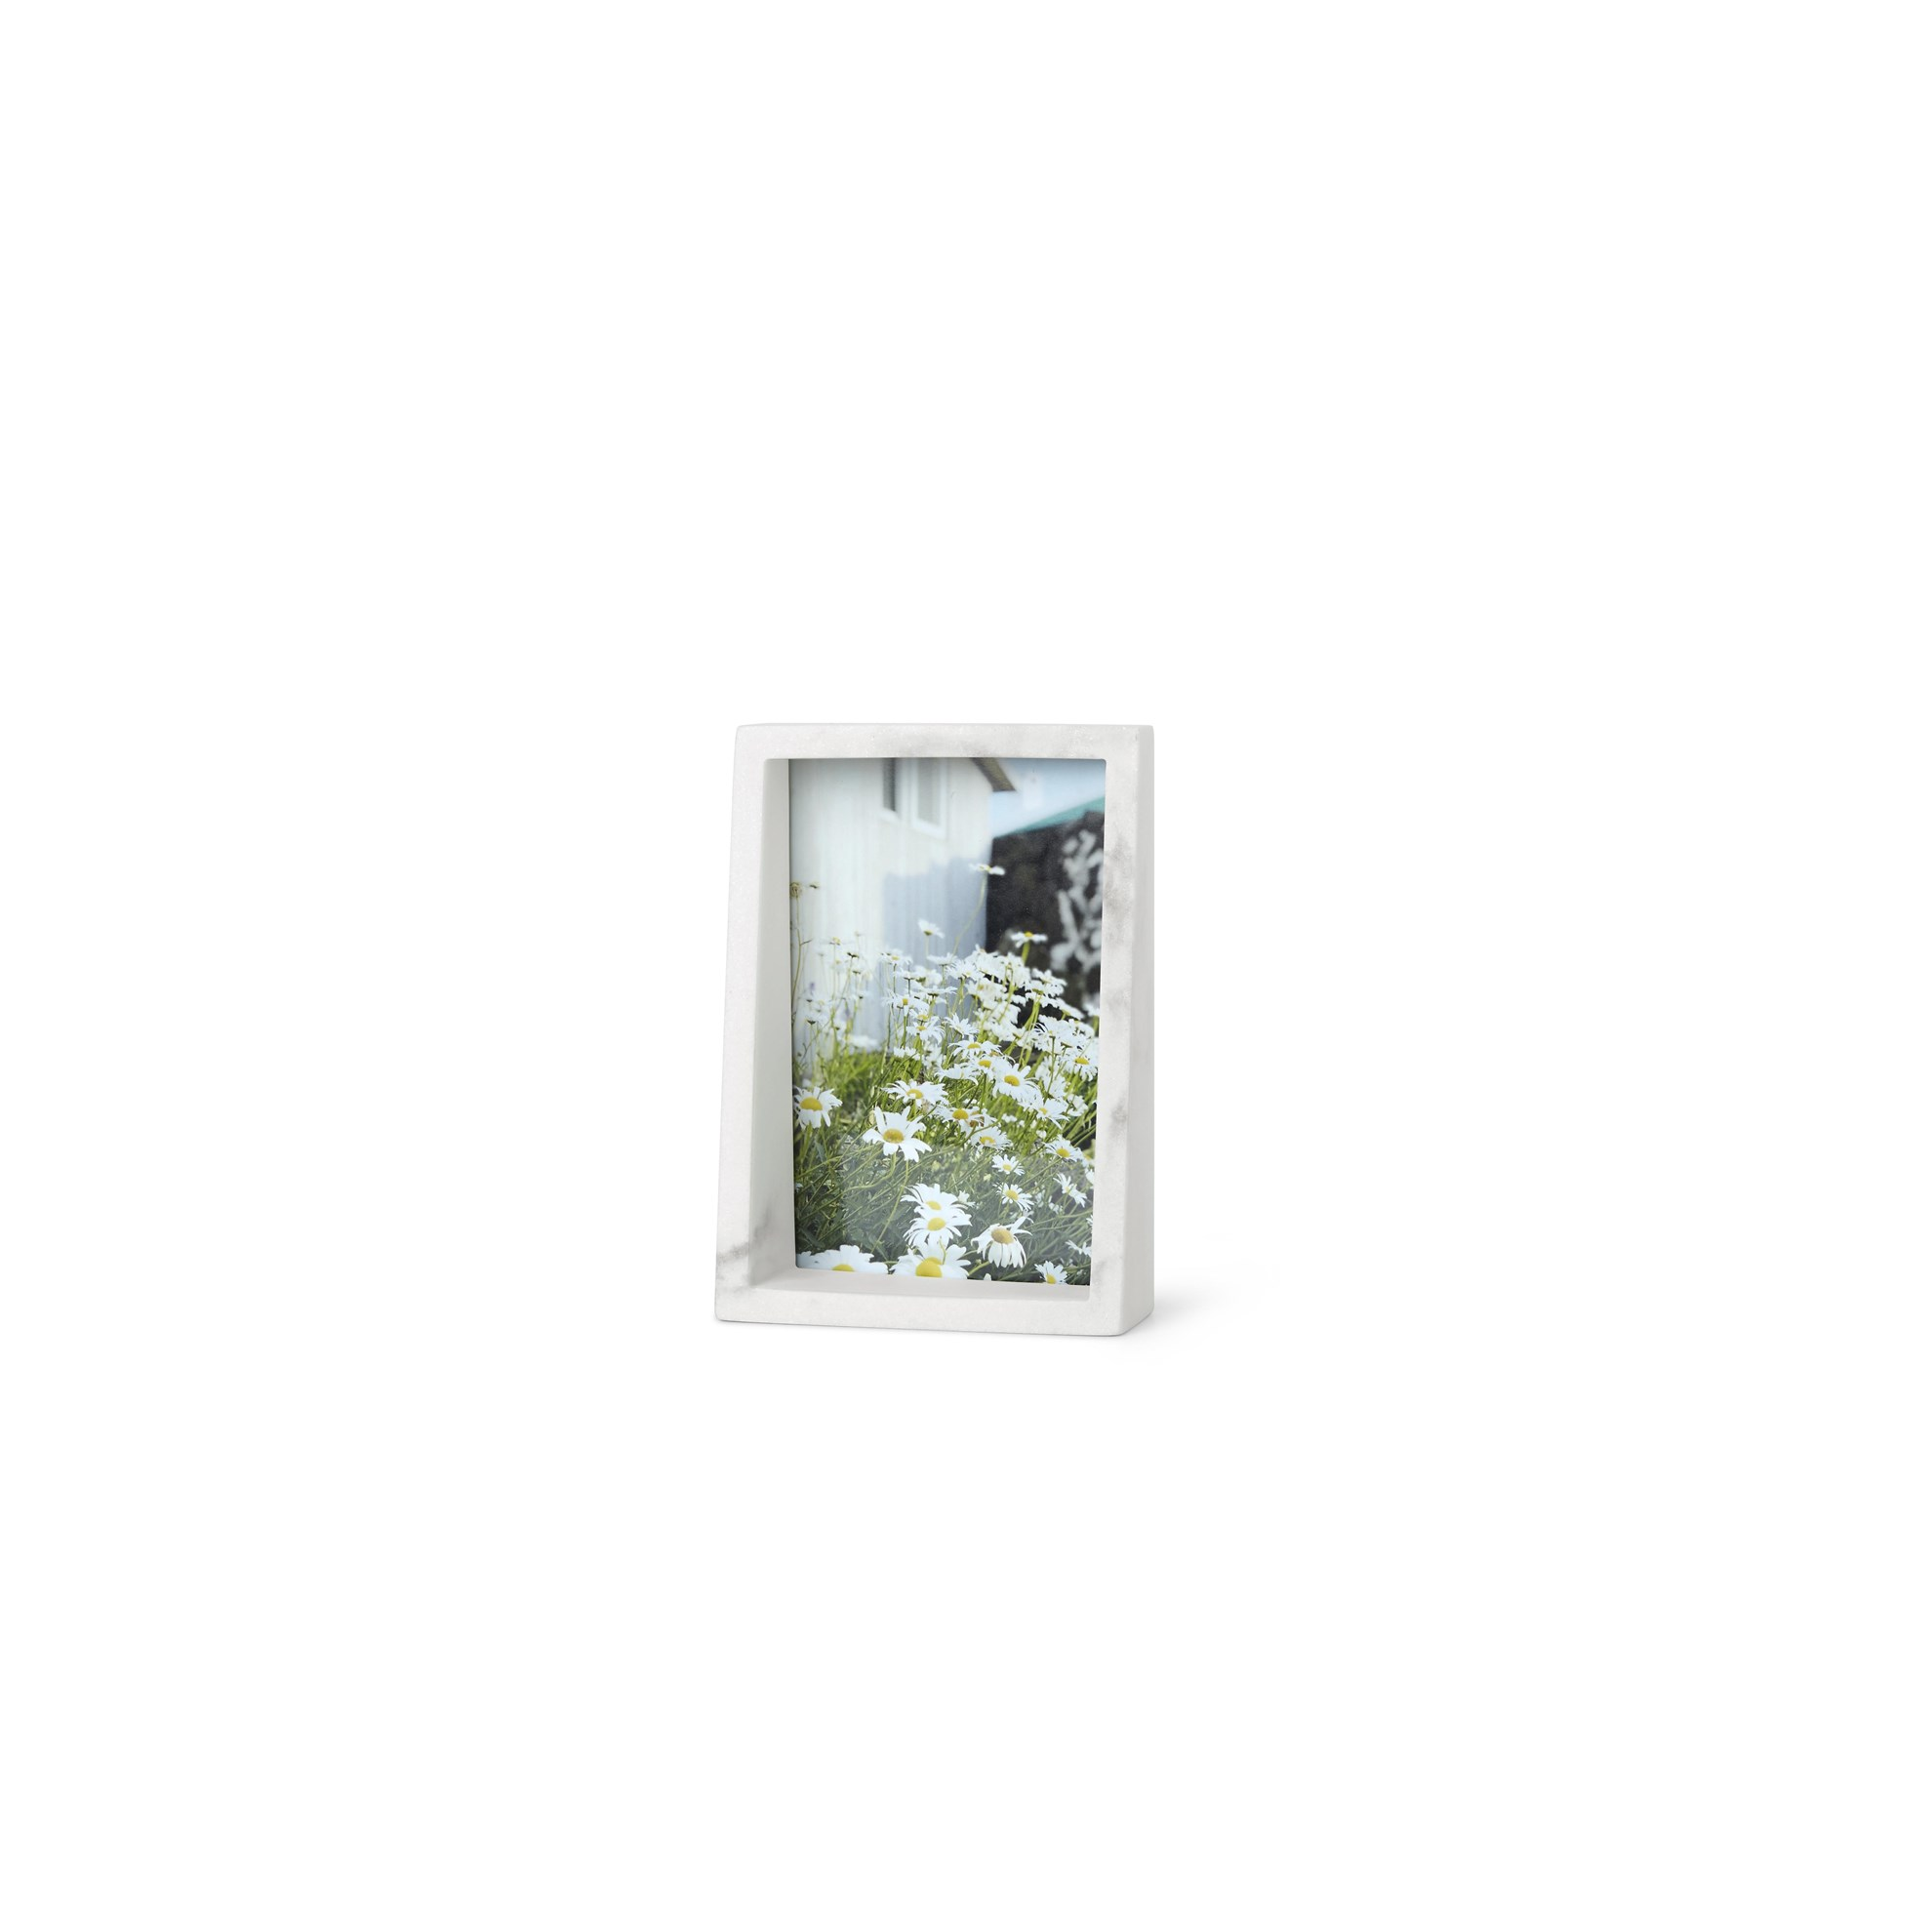 Fotorámeček EDGE MARBLE 10x15 bílý mramor_0